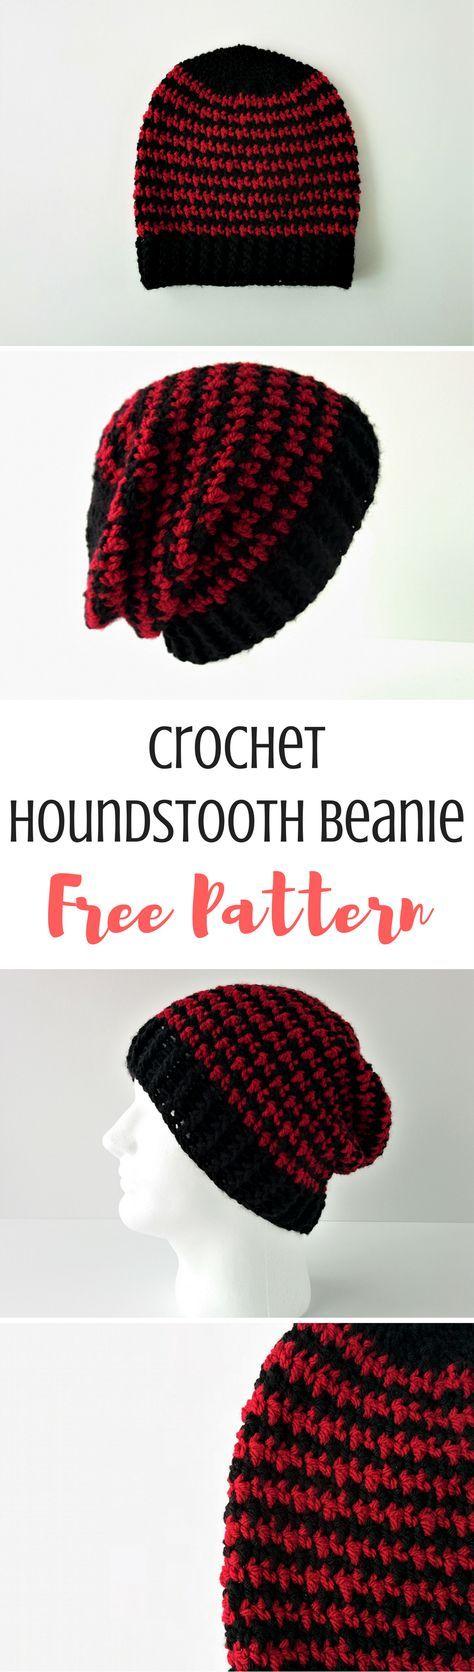 Mejores 16 imágenes de crochet en Pinterest | Patrones de ganchillo ...